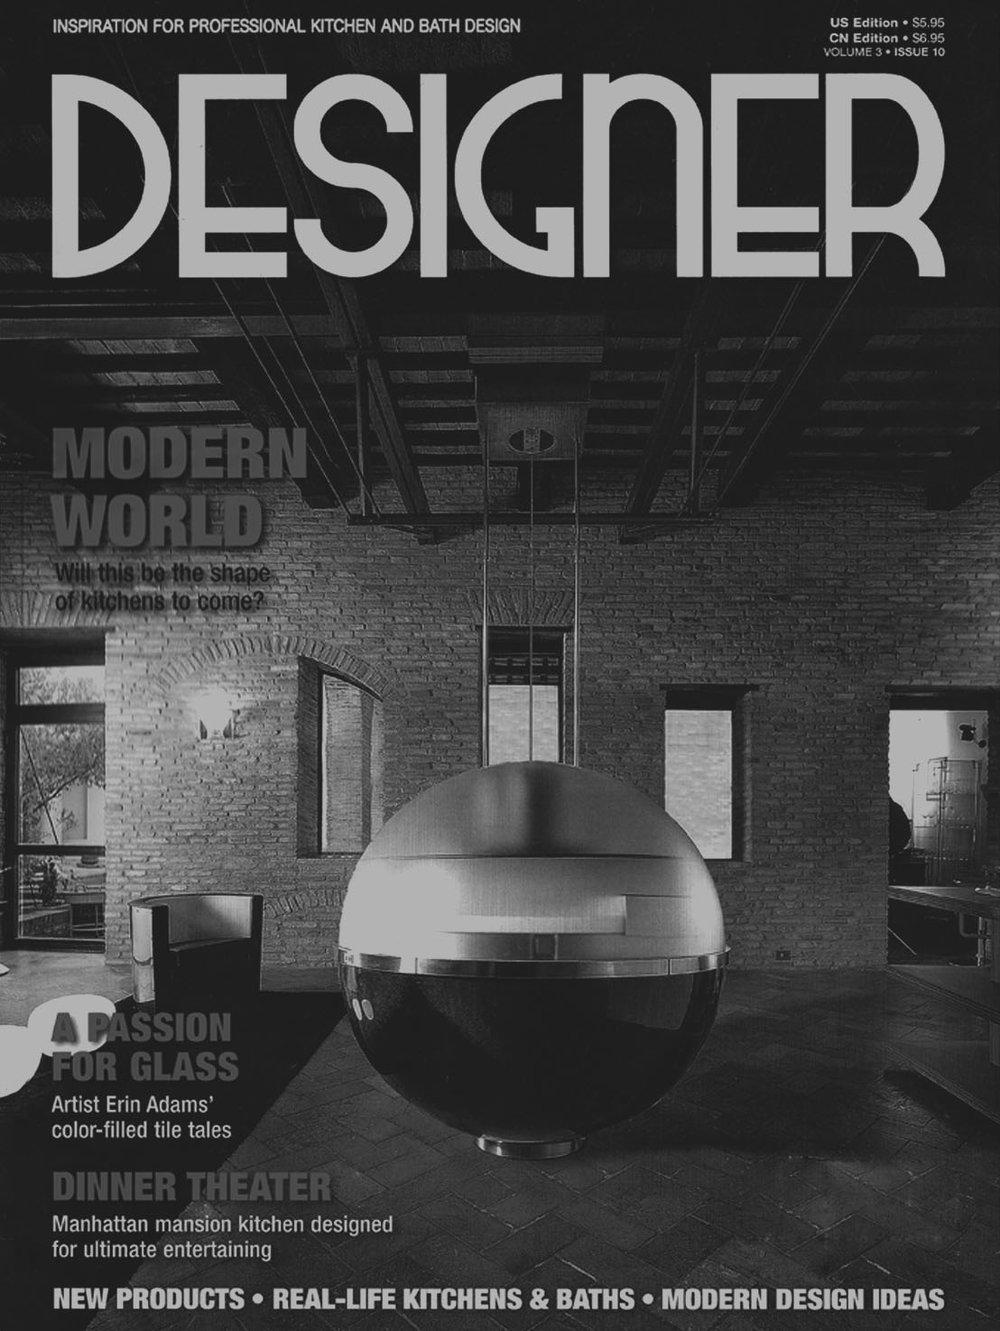 Best Hospitality Designer Lower Manhattan, NY | Joe Ginsberg Design | 10004 and 10005